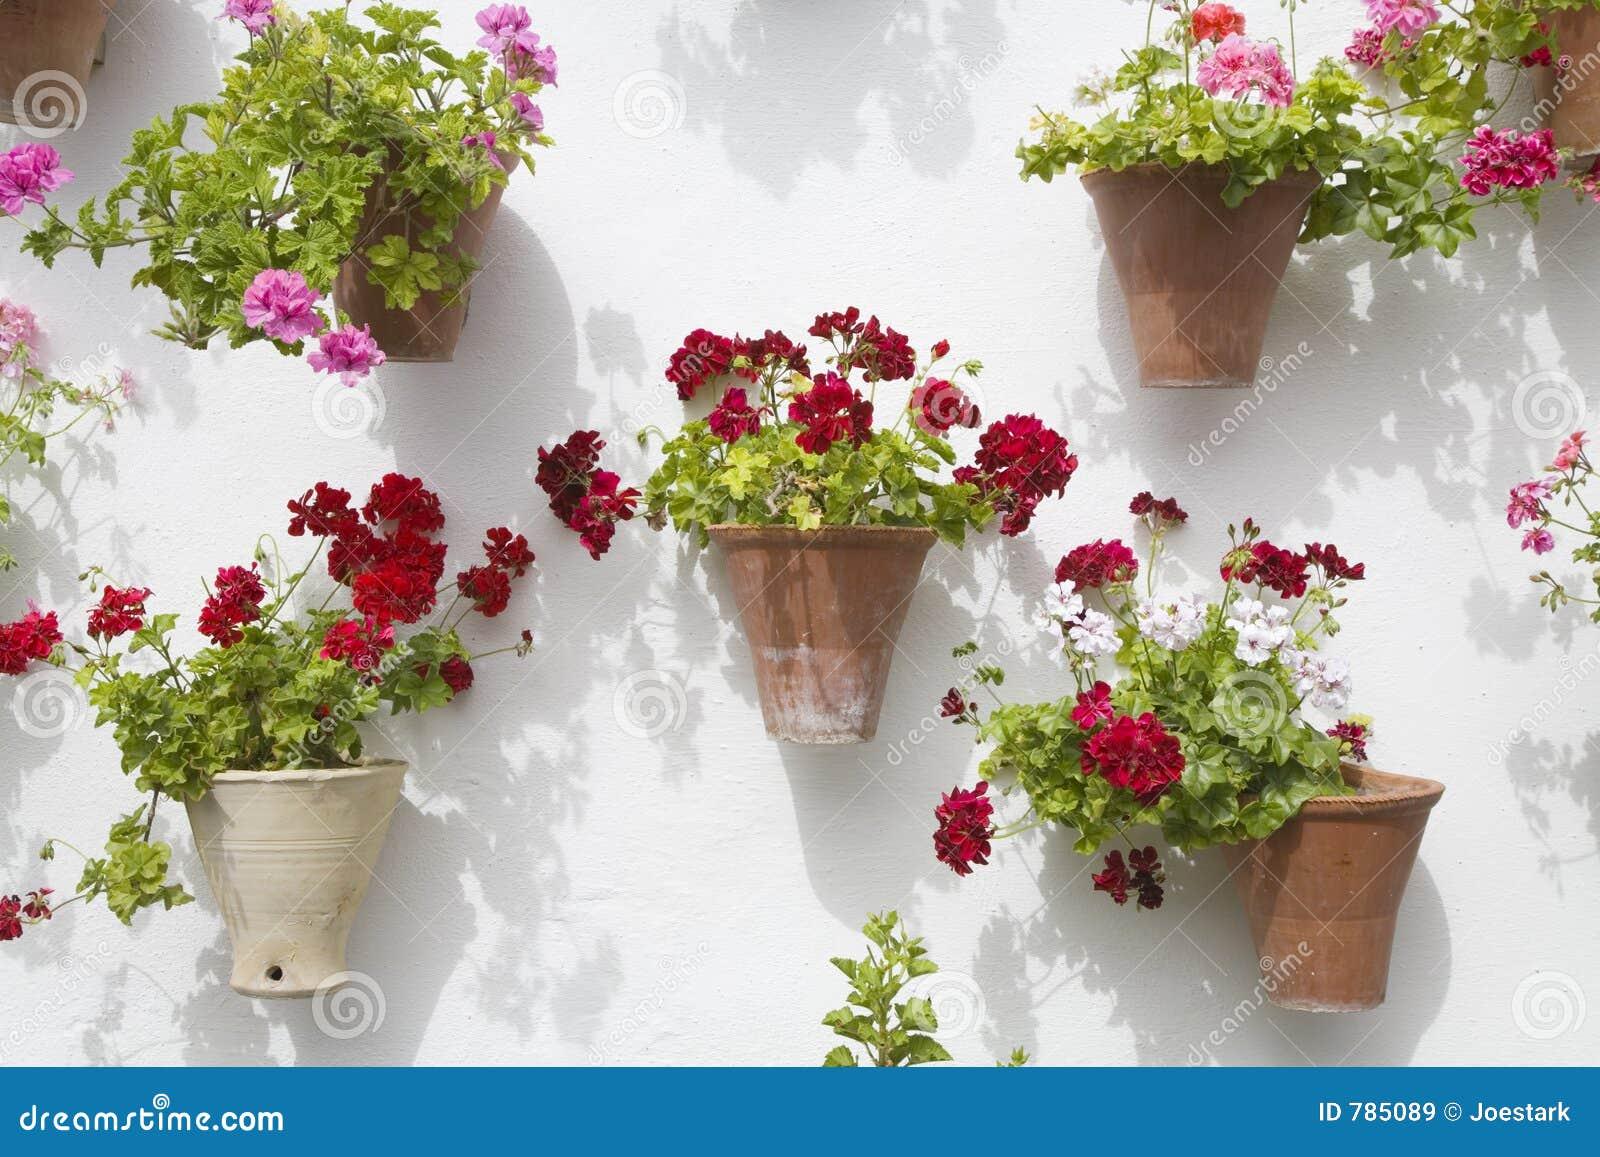 Spanish Flowers Royalty Free Stock Image